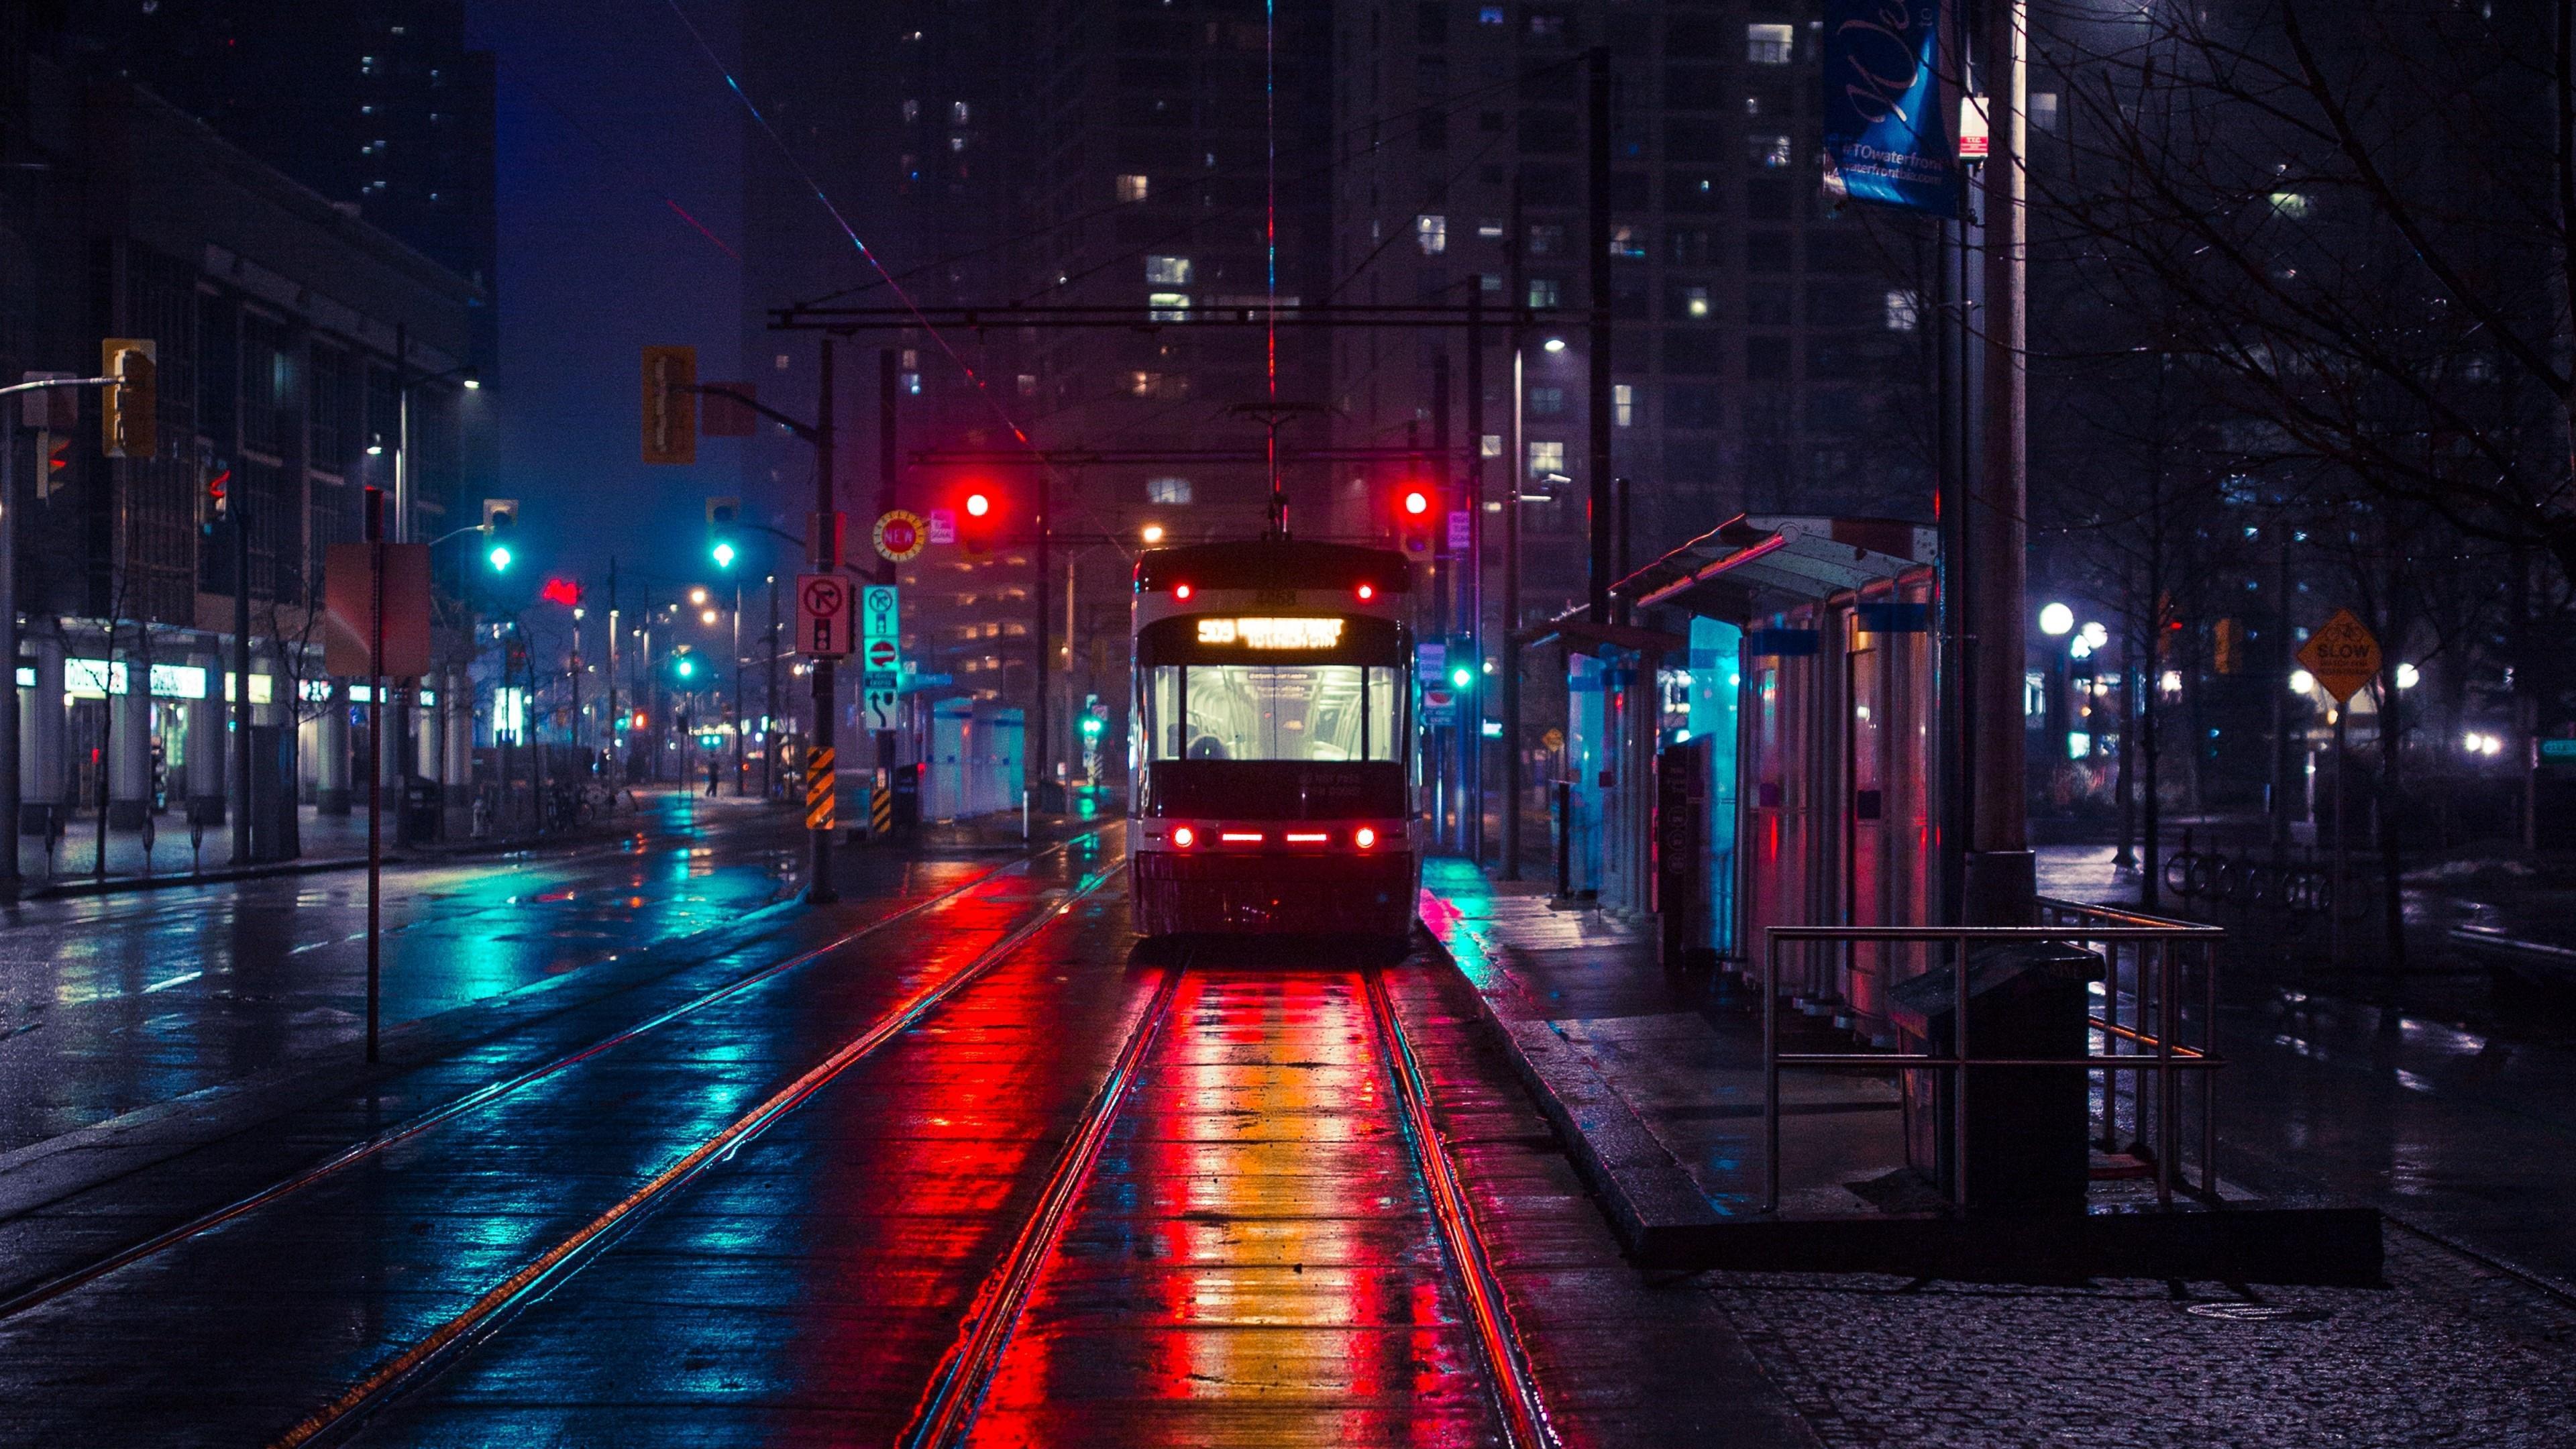 Tram in the night city wallpaper